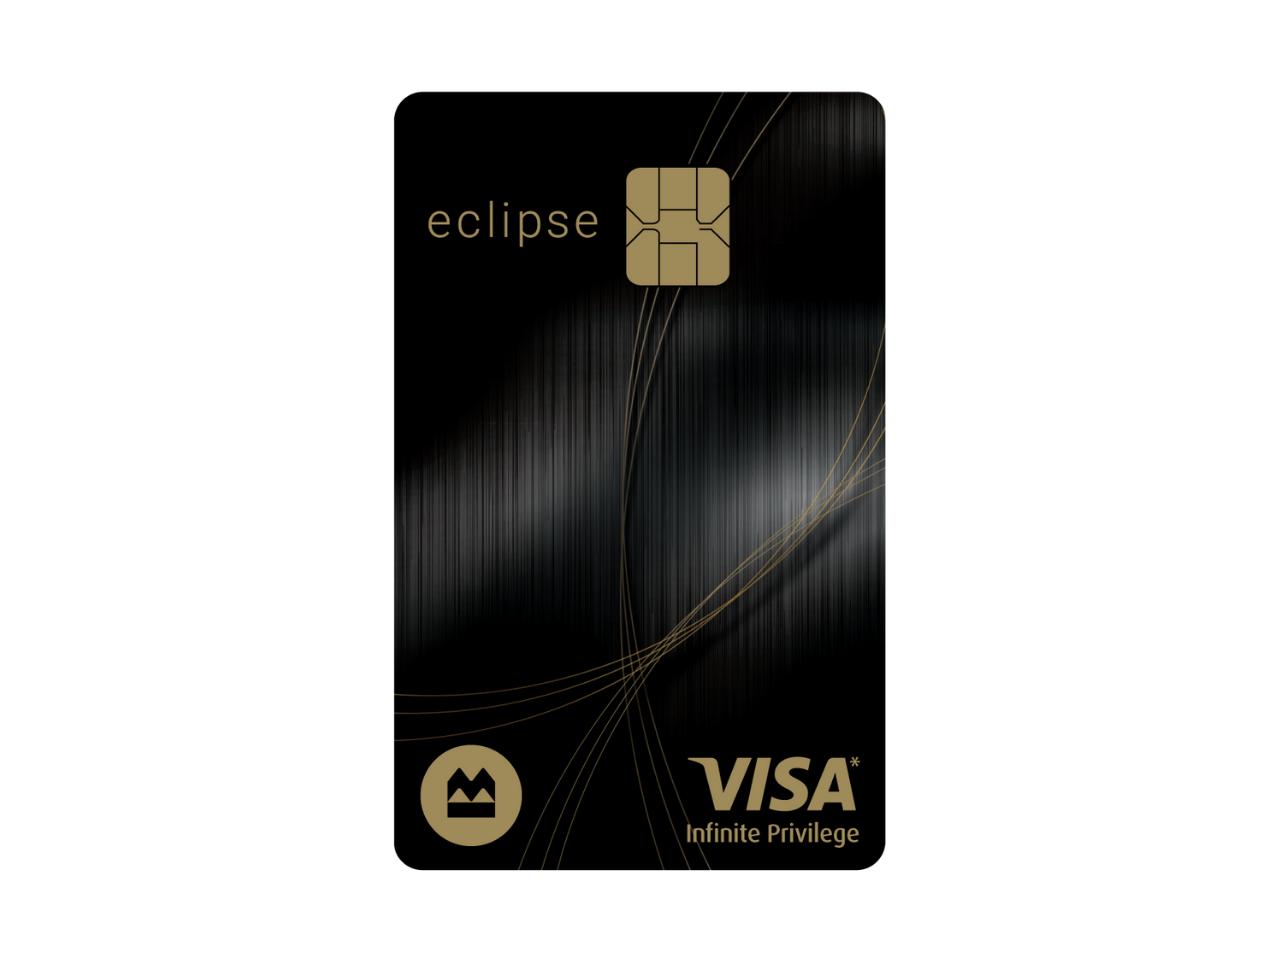 BMO eclipse Visa Infinite Privilege* Card Review